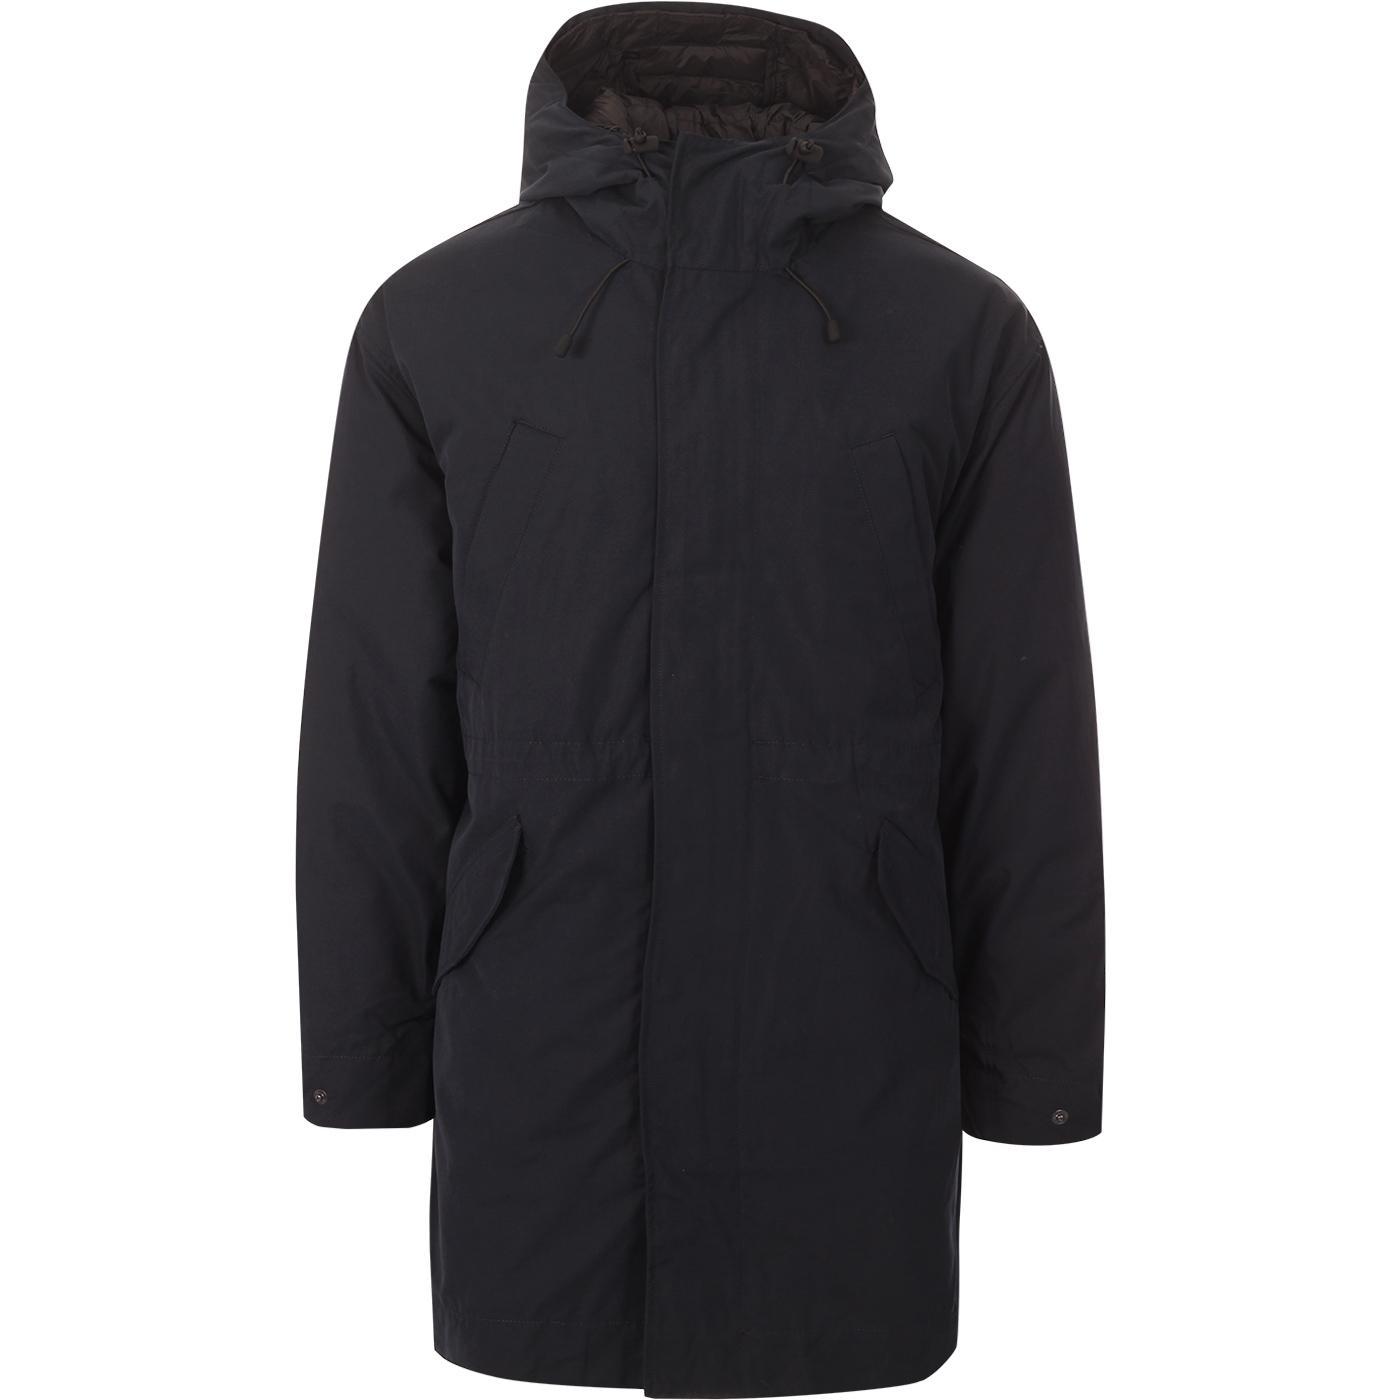 Melville FARAH Retro Mod Hooded Parka Jacket (TN)